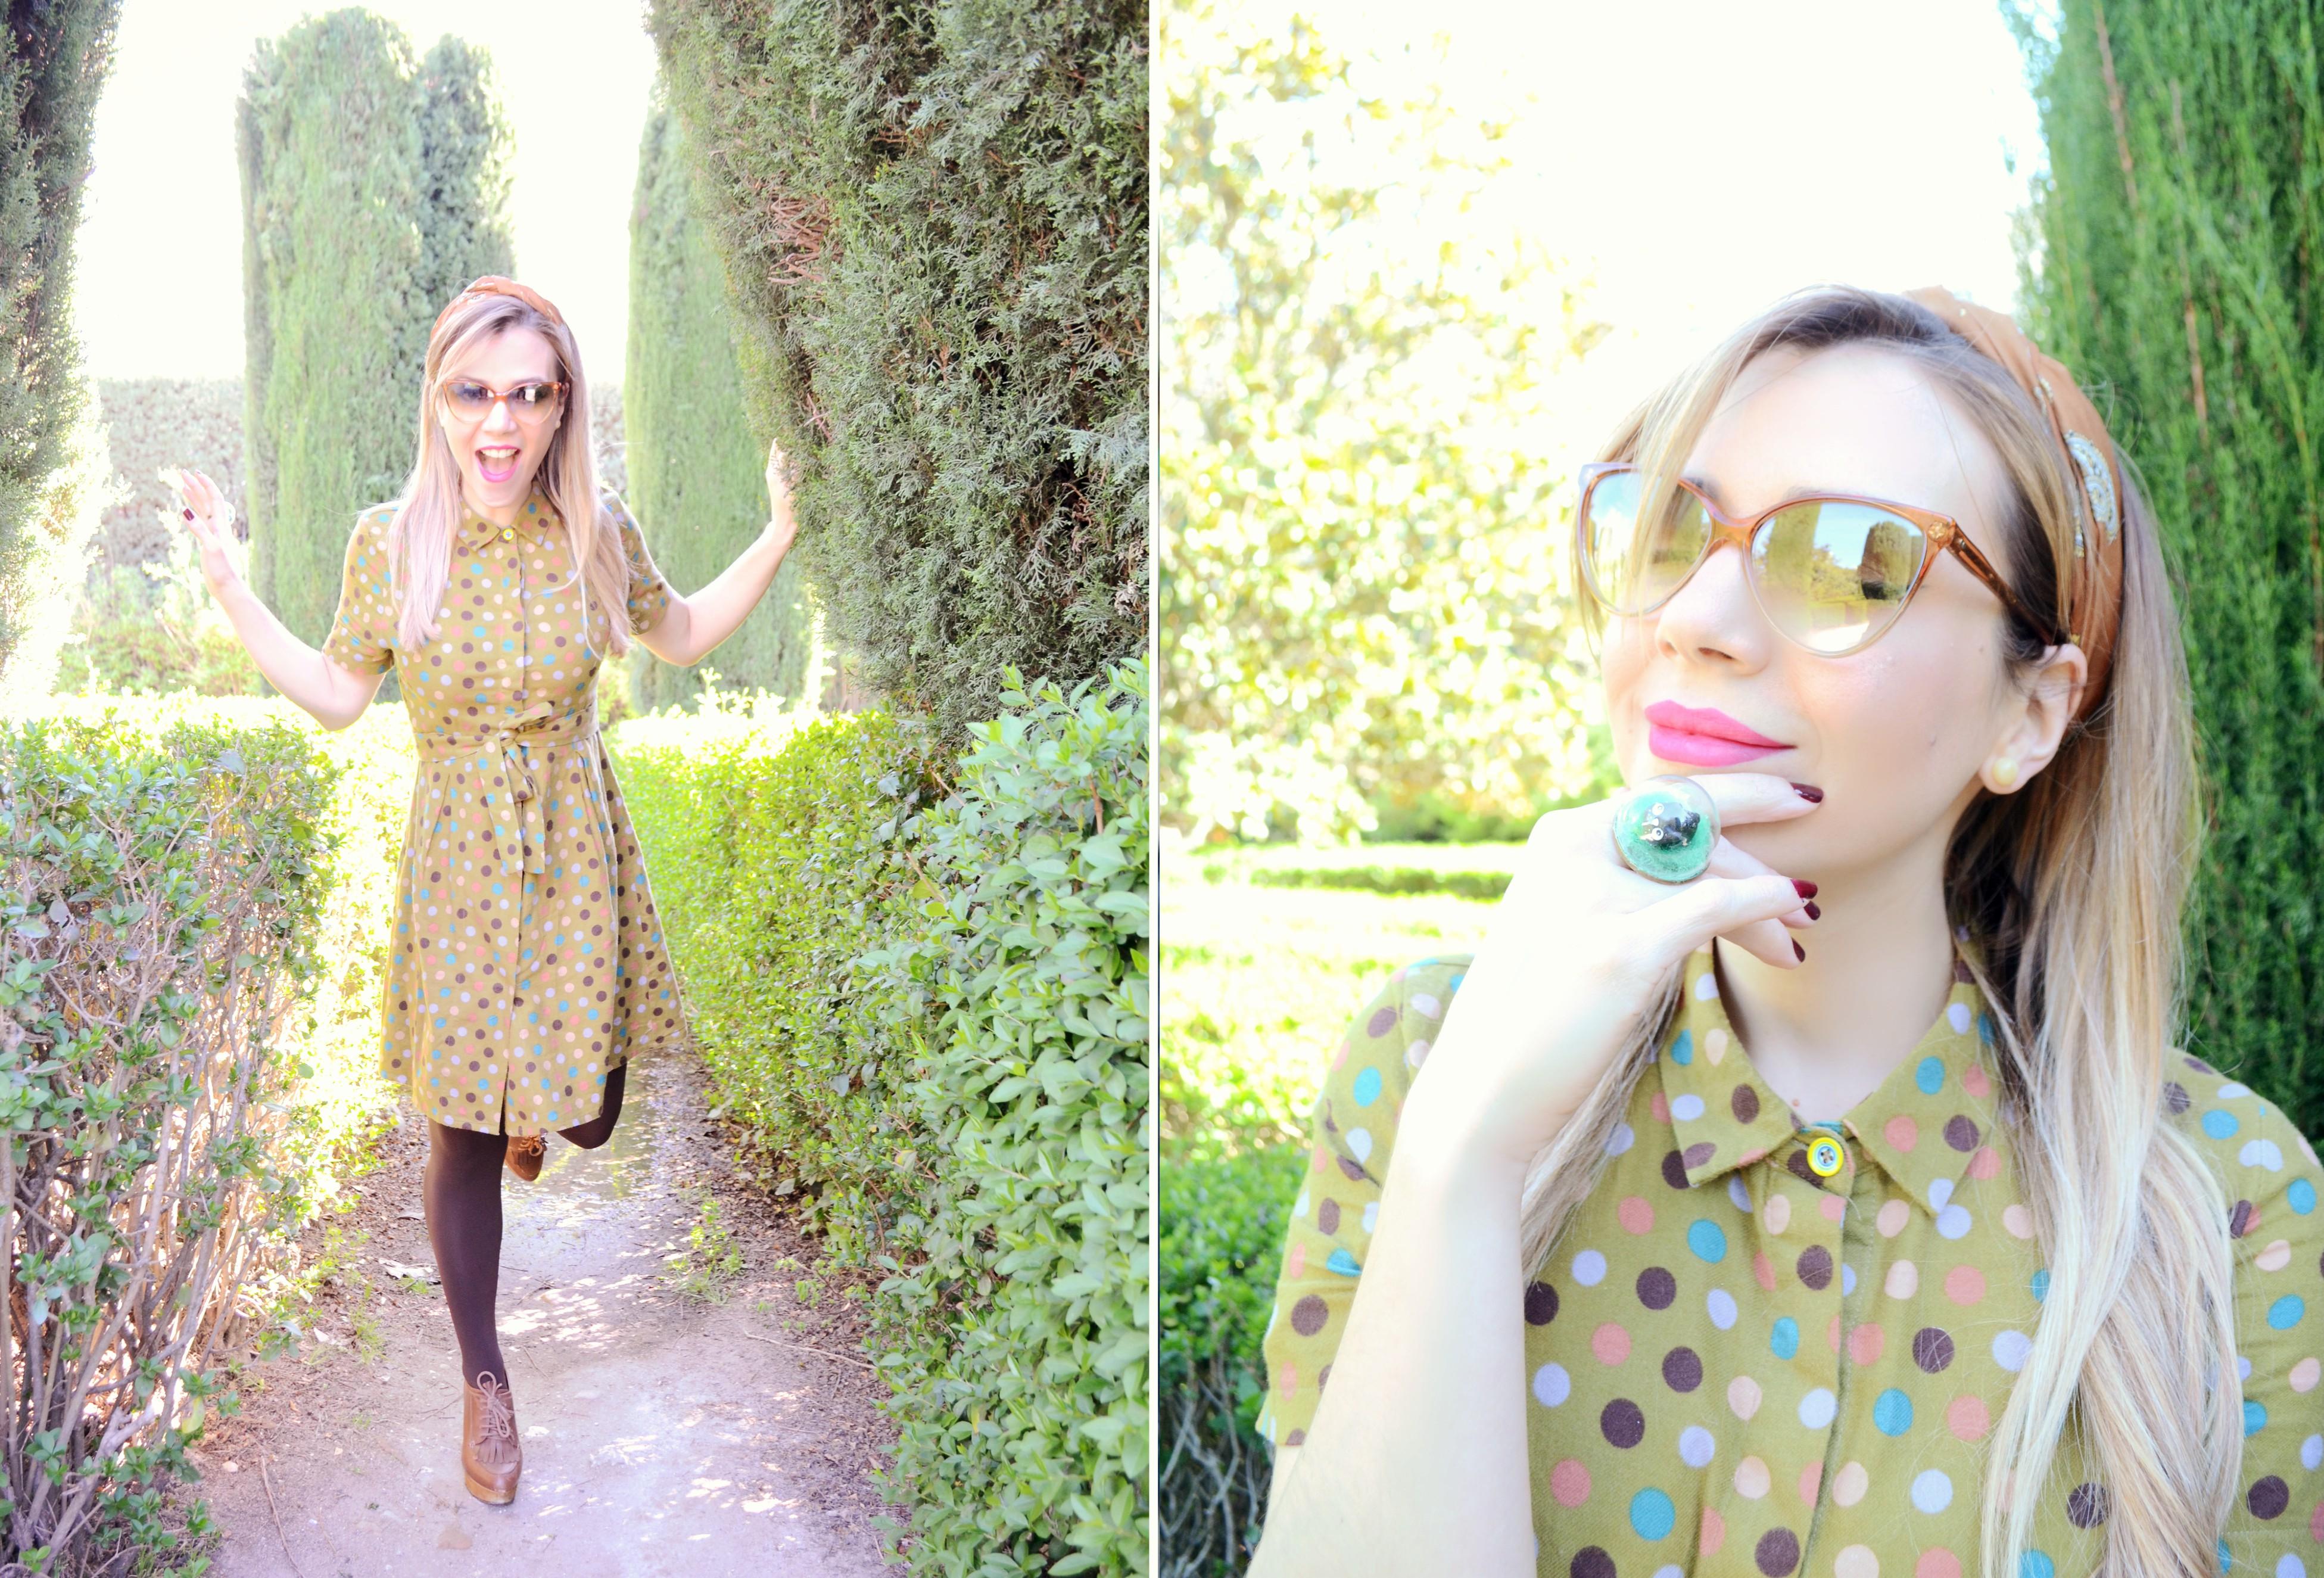 Fashionista-vestido-de-lunares-influencer-Madrid-ChicAdicta-blog-de-moda-Chic-Adicta-polkadot-dress-PiensaenChic-Piensa-en-Chic